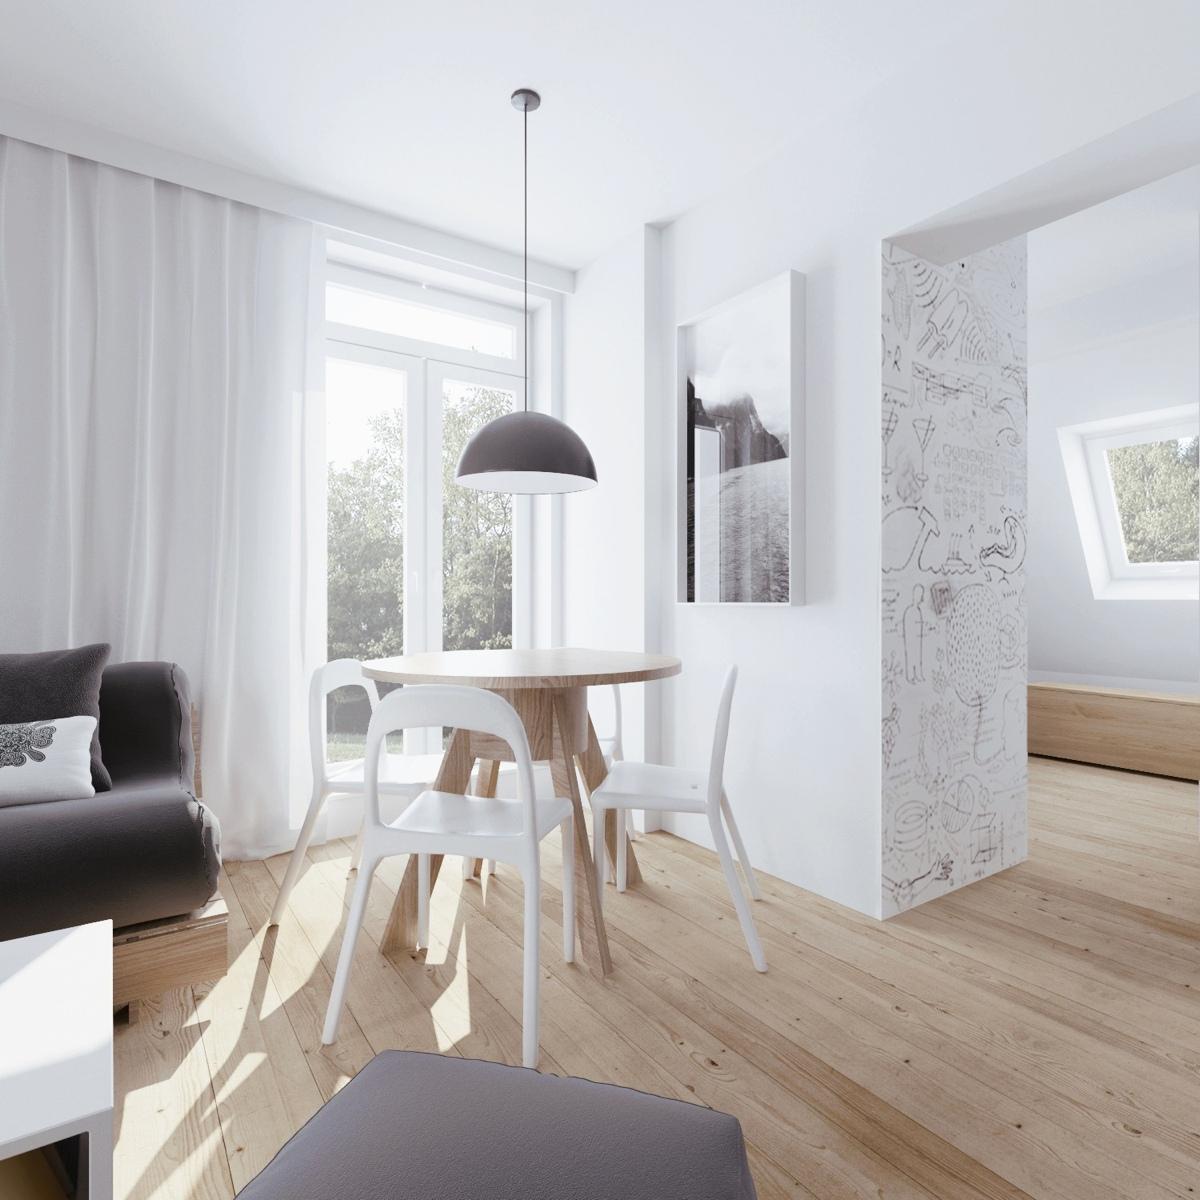 Minimalist apartment design with soft color scheme for Minimalist color scheme interior design